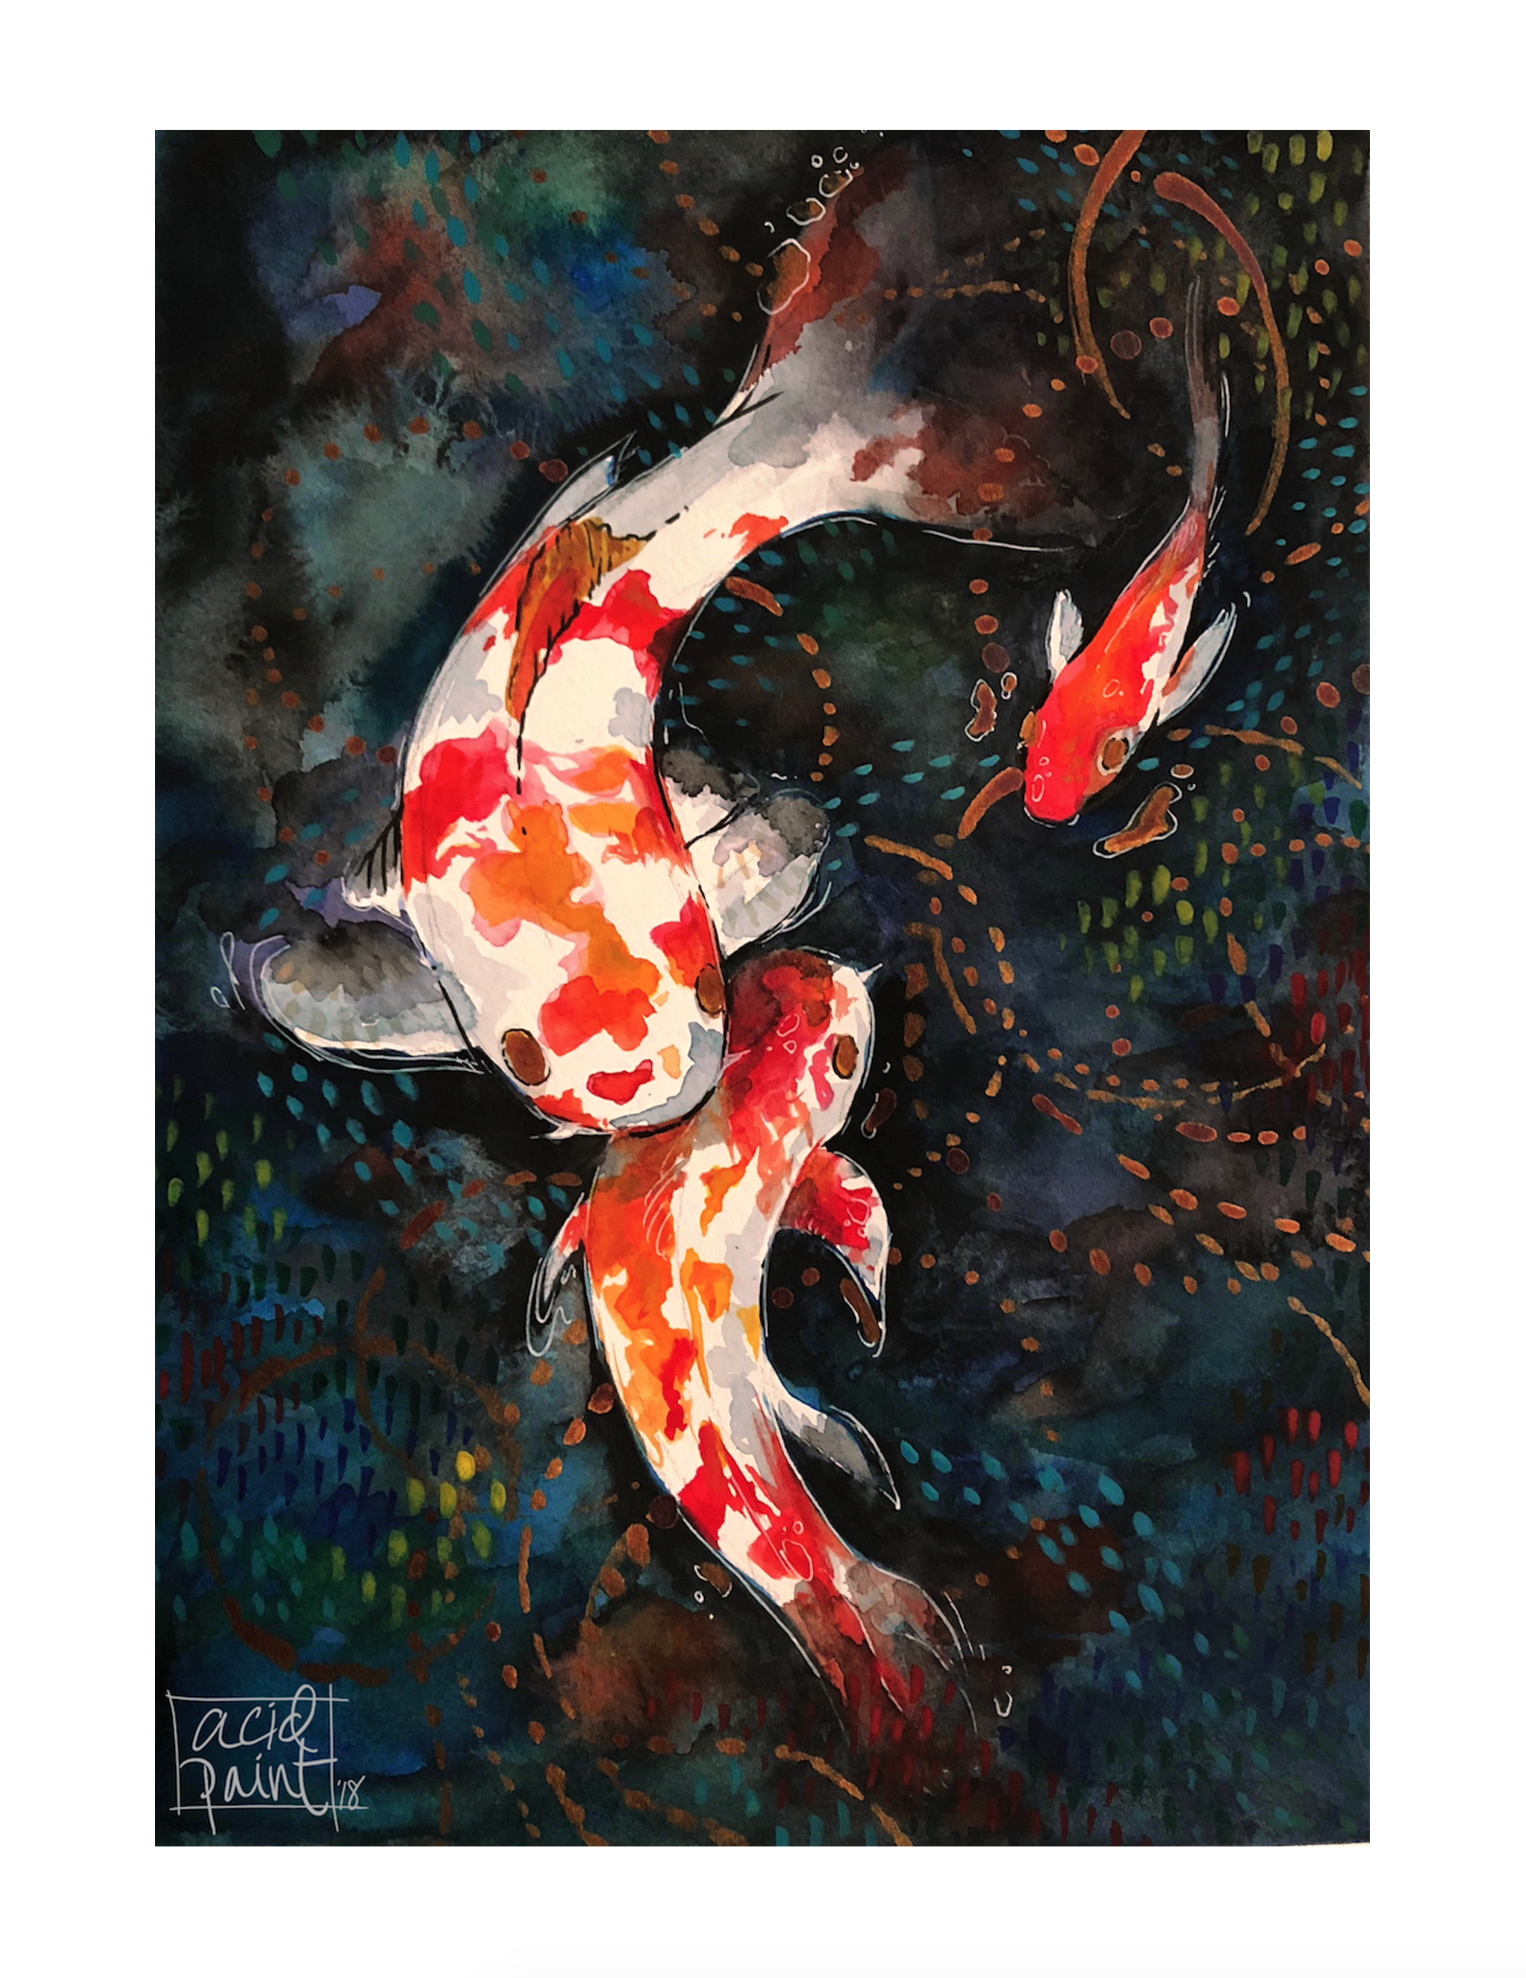 koifish in my dreams 8x11 watercolor | Art | Pinterest | Watercolor ...